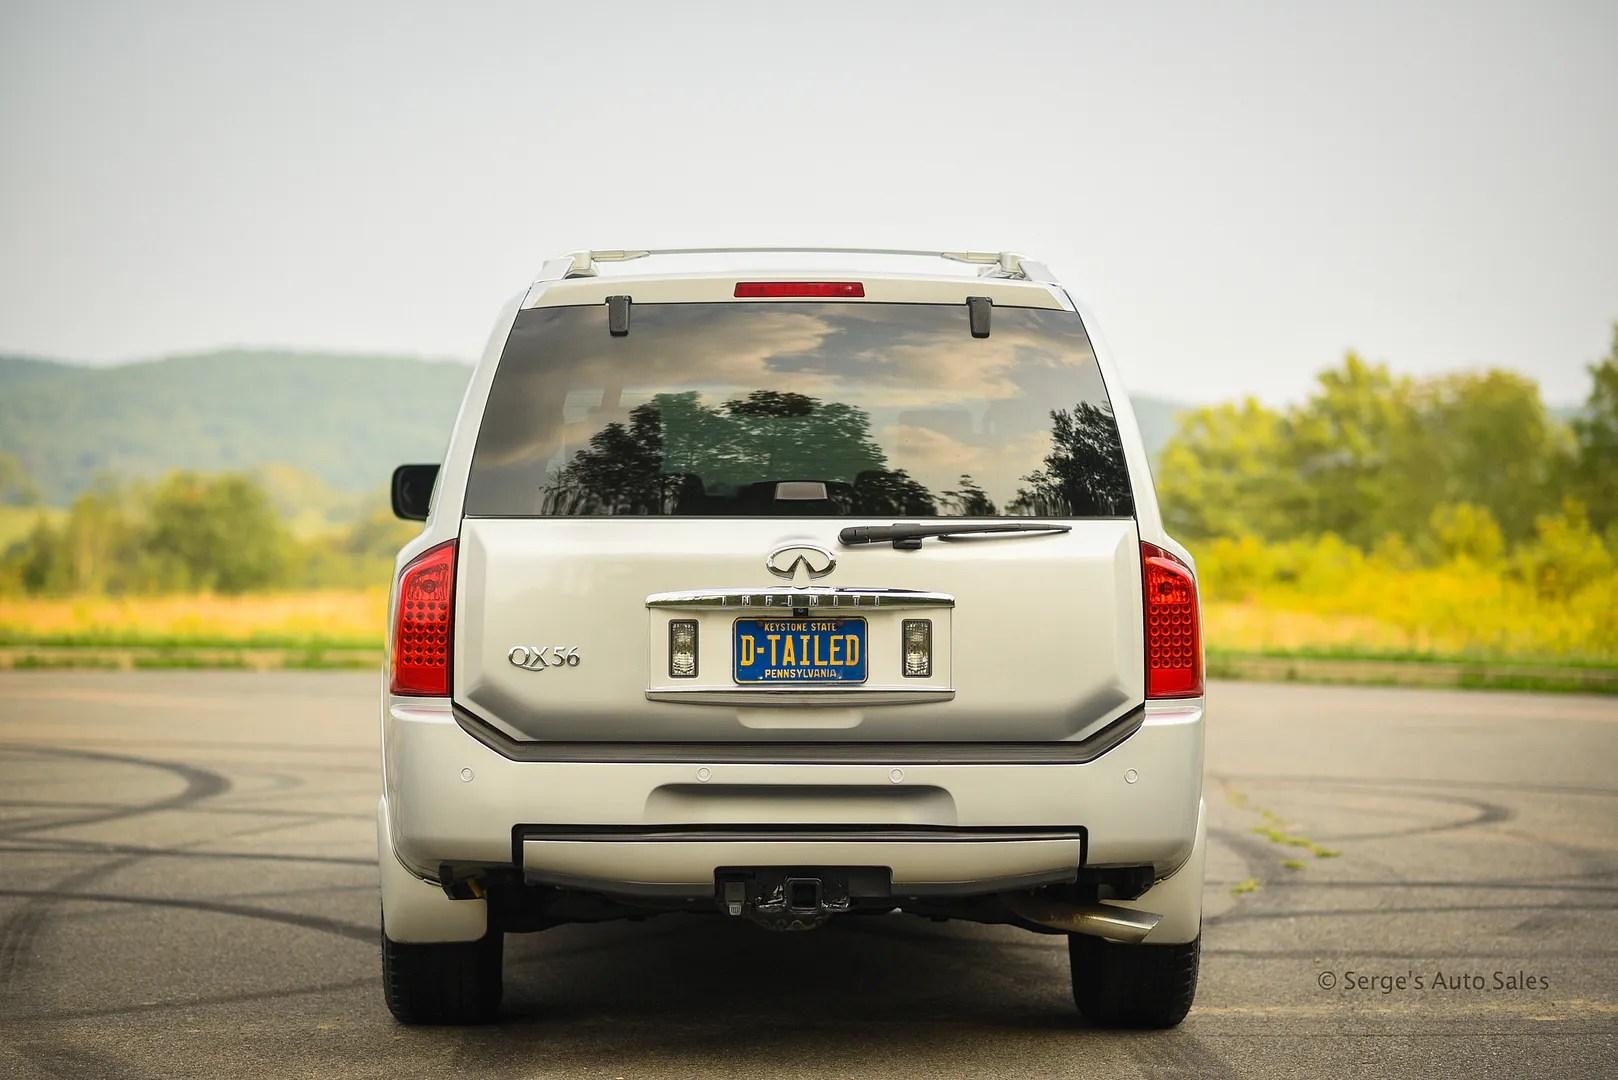 photo Infiniti-Serges-Auto-Sales-Car-dealer-Pennsylvania-QX56-Scranton-Nepa-6_zpsm67jrce0.jpg